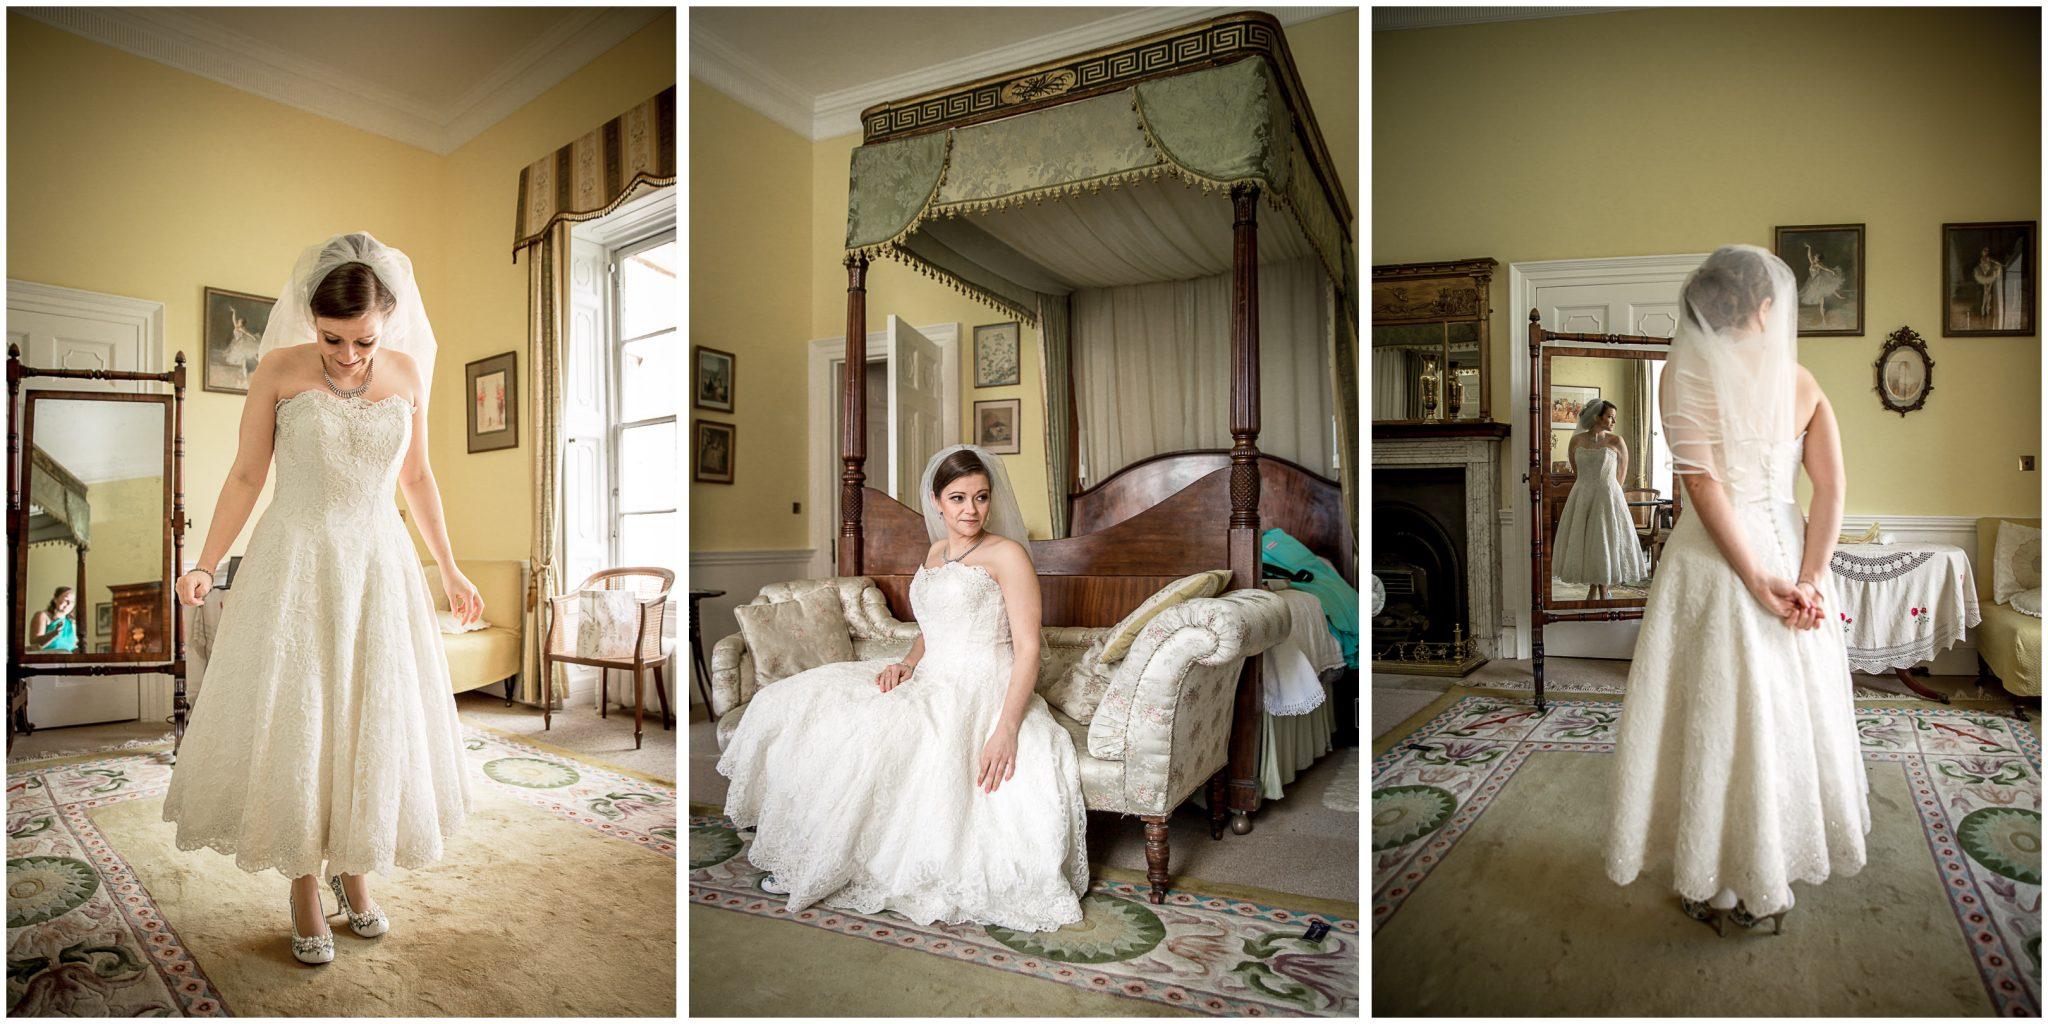 Avington Park wedding photography bridal portraits before ceremony